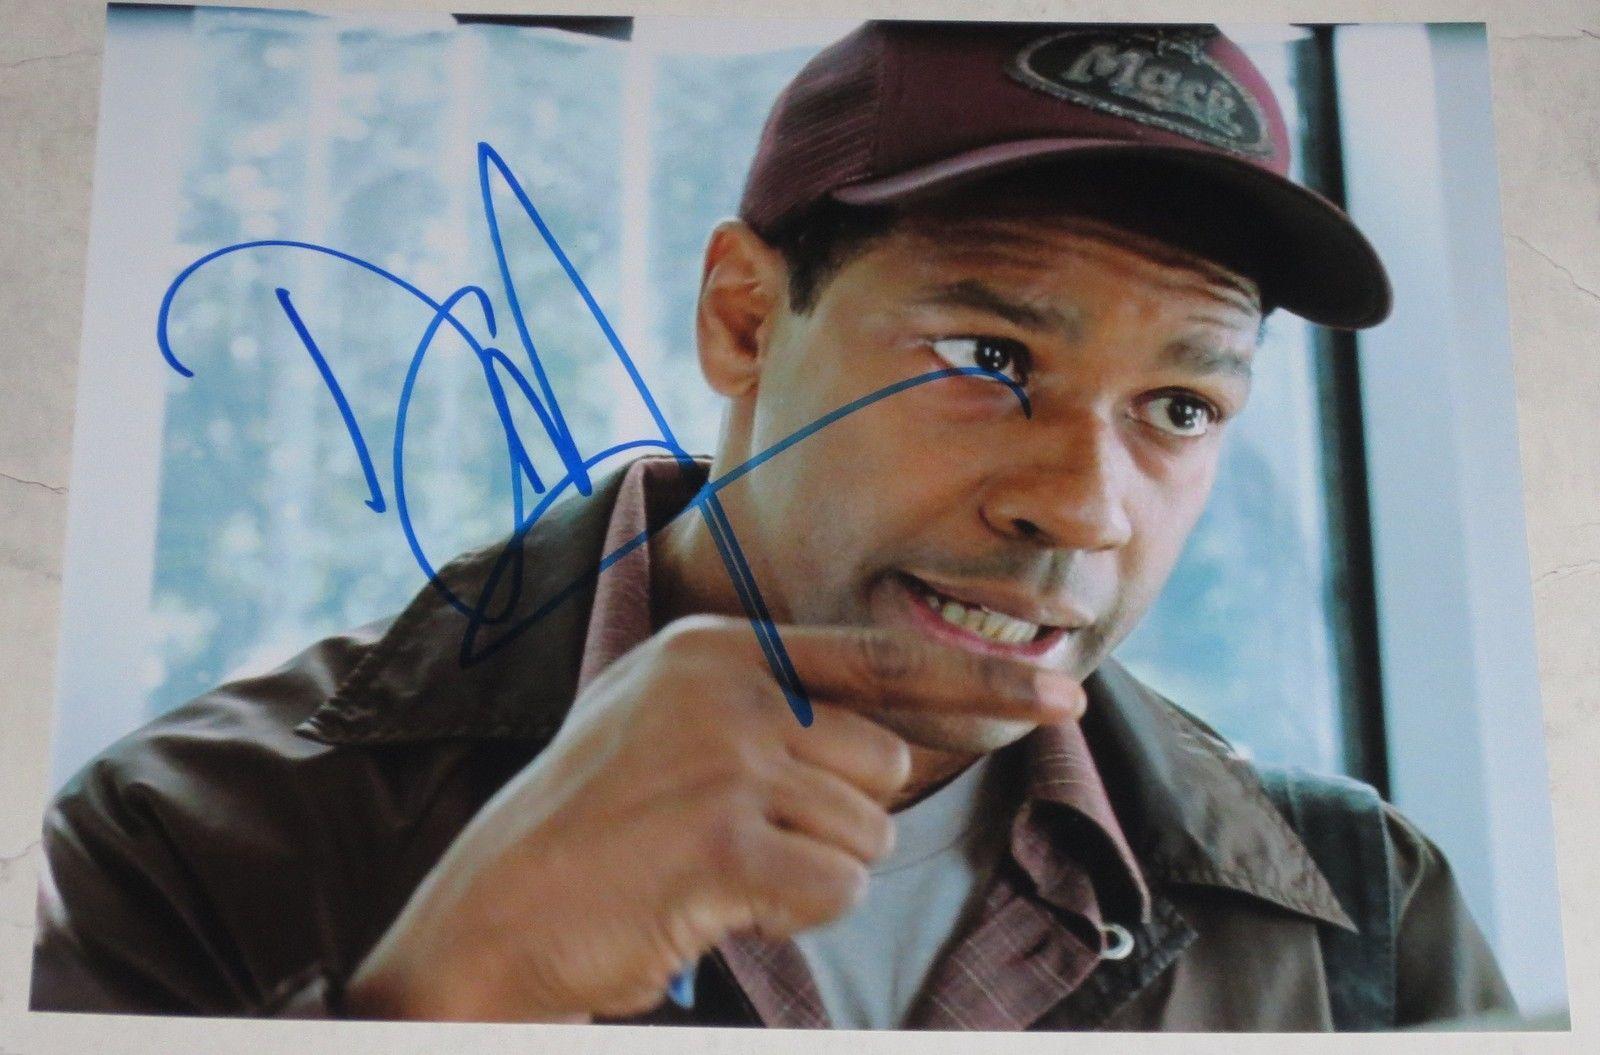 Denzel Washington Signed 8x10 Photo Autograph John Q Oscar Authentic Coa A